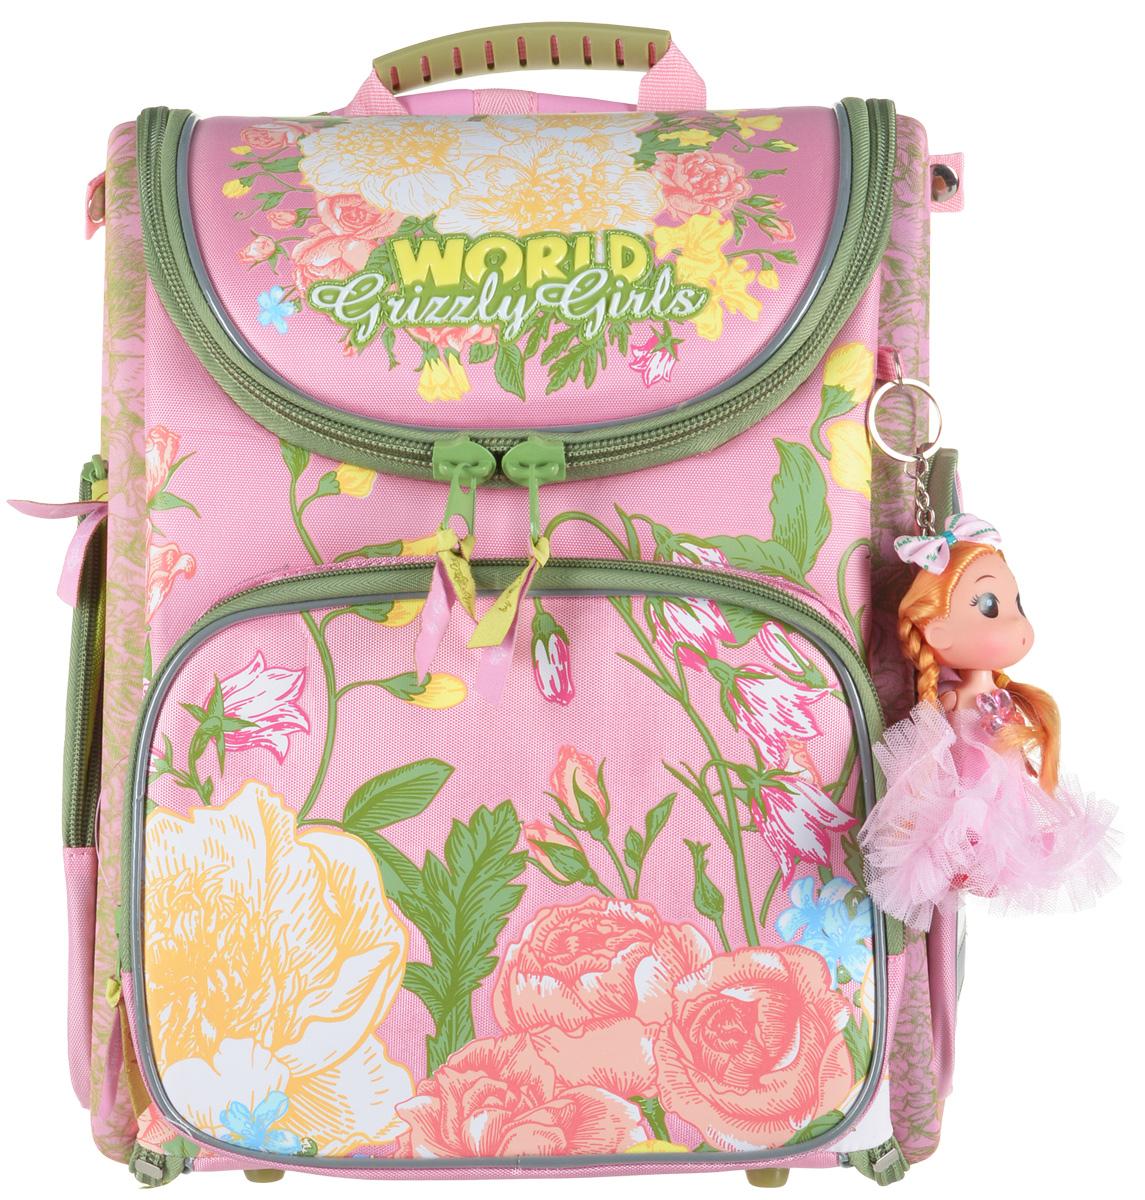 Grizzly Рюкзак с мешком для обуви цвет розовый RA-871-4 steiner рюкзак для 4 11 классов 4 st4 steiner